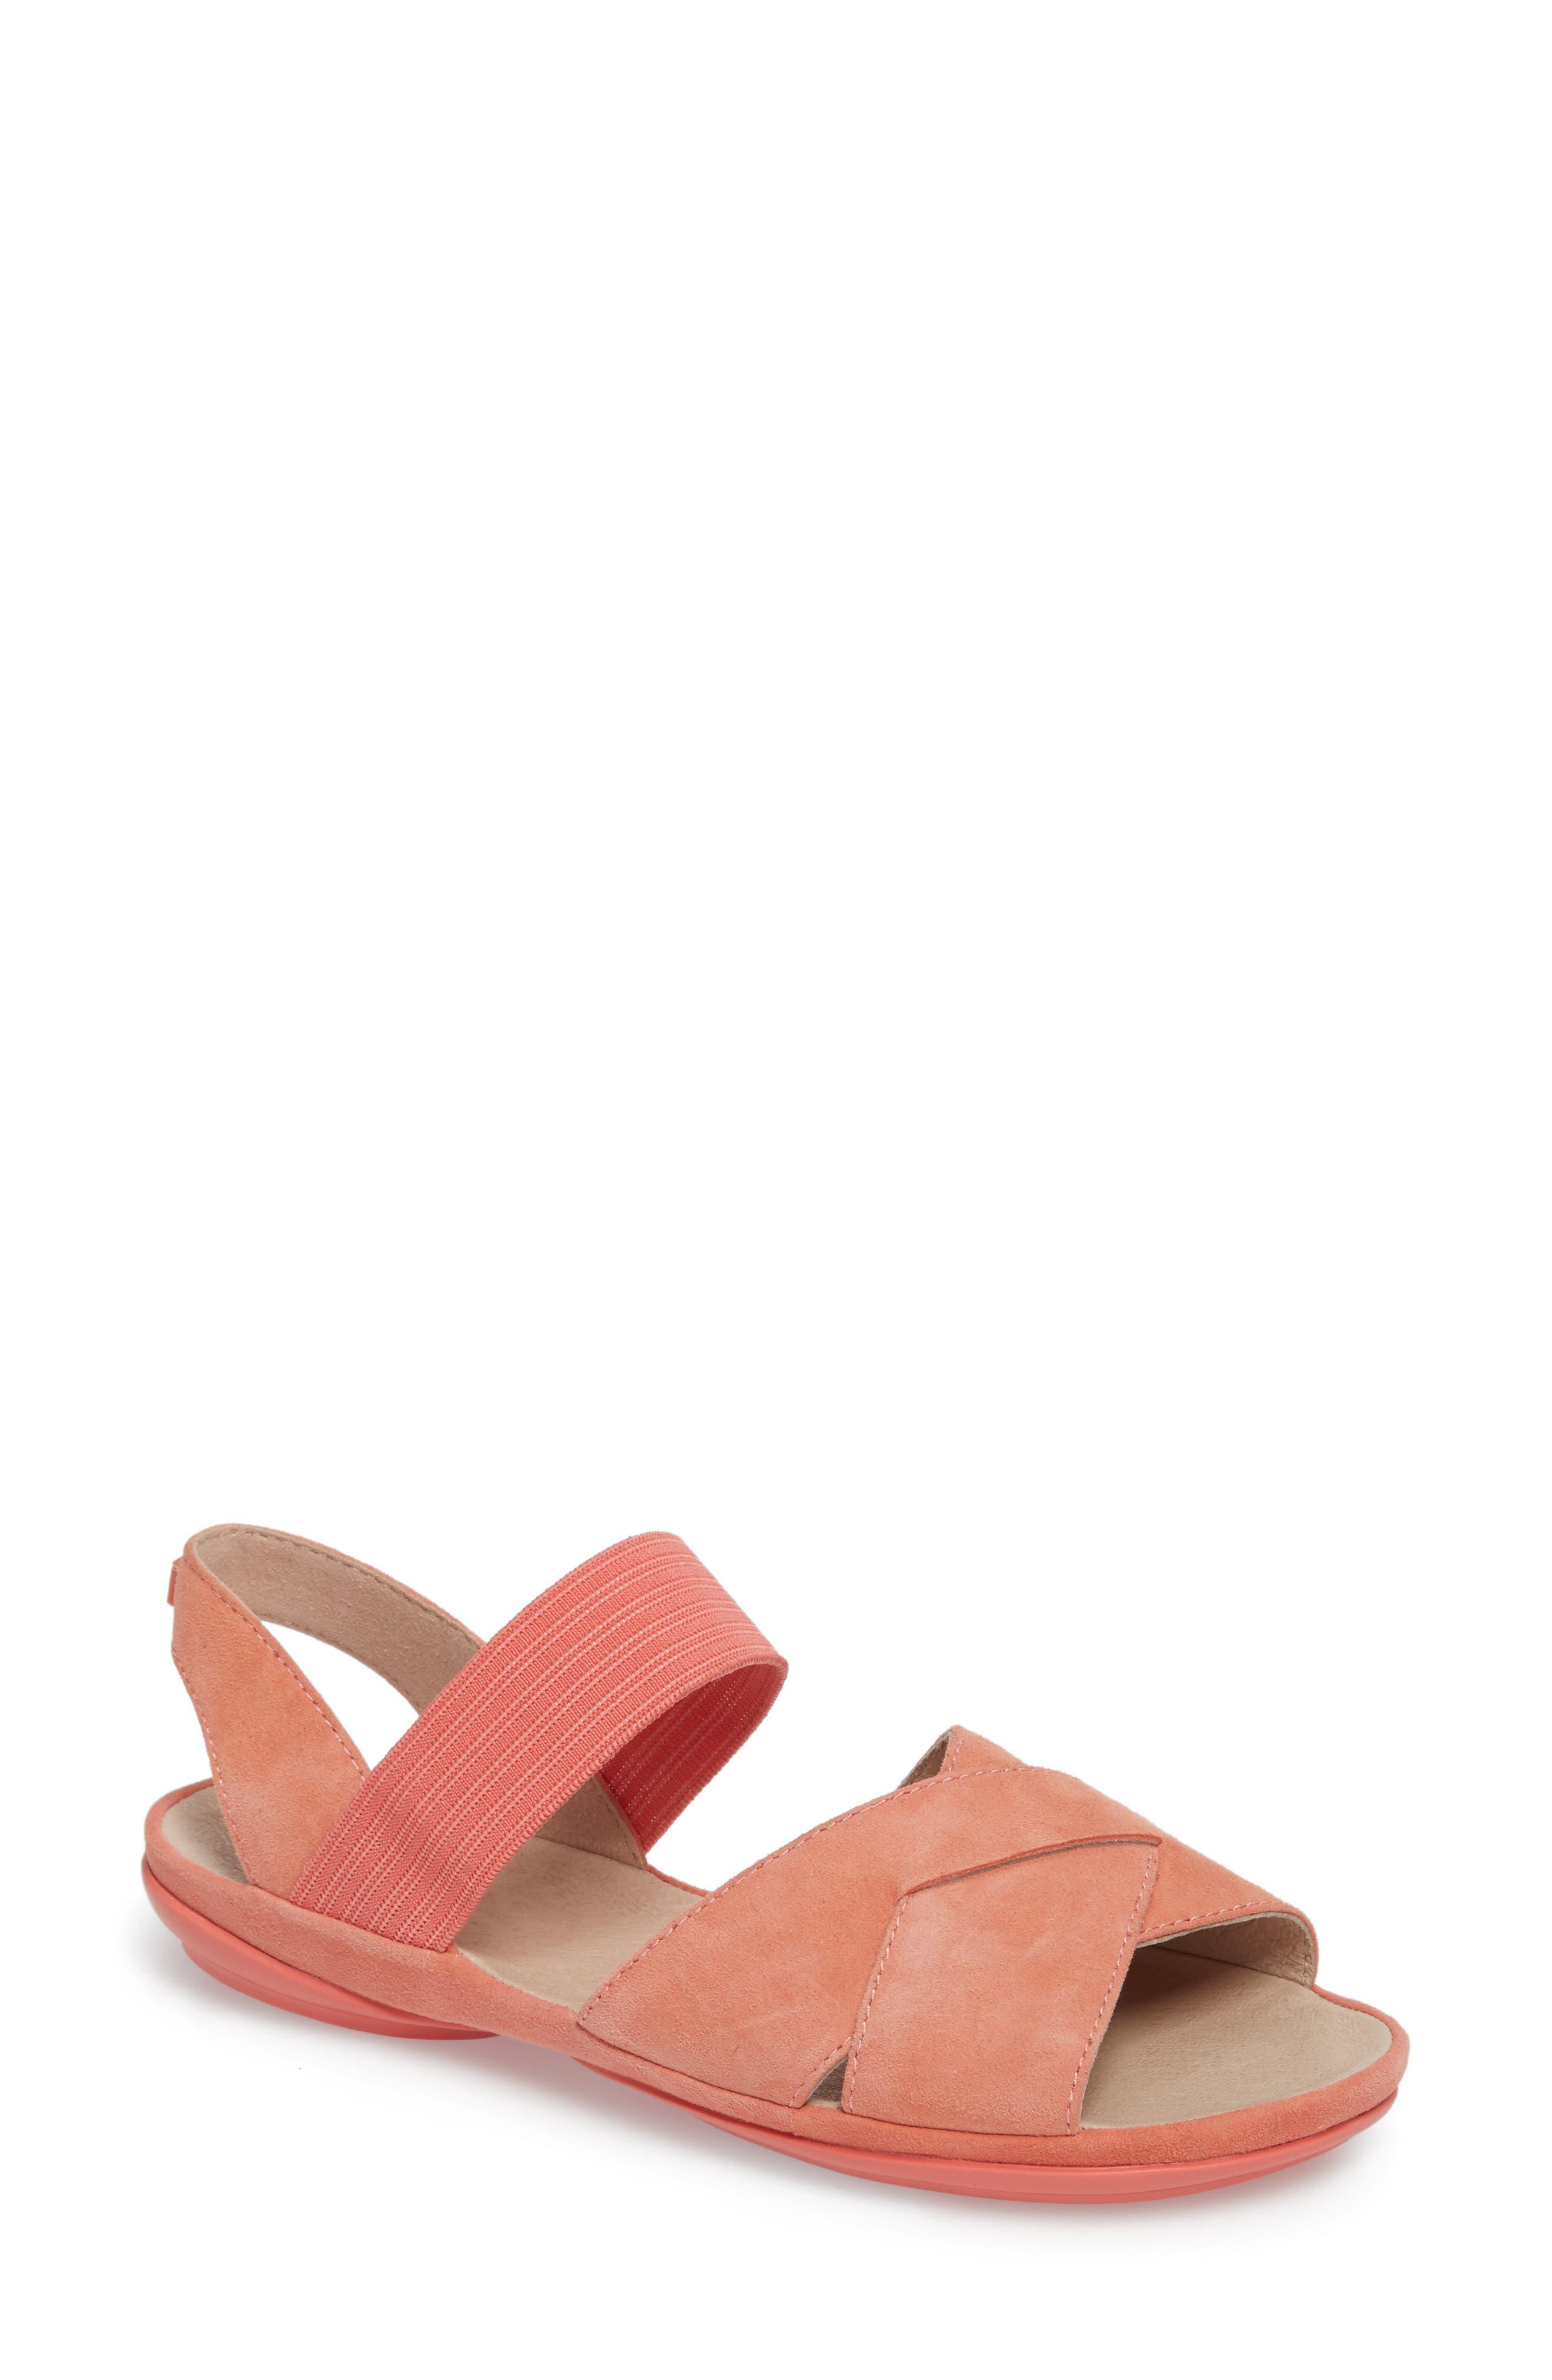 Right Nina Flat Cross Strap Sandal,                             Main thumbnail 1, color,                             Medium Pink Leather